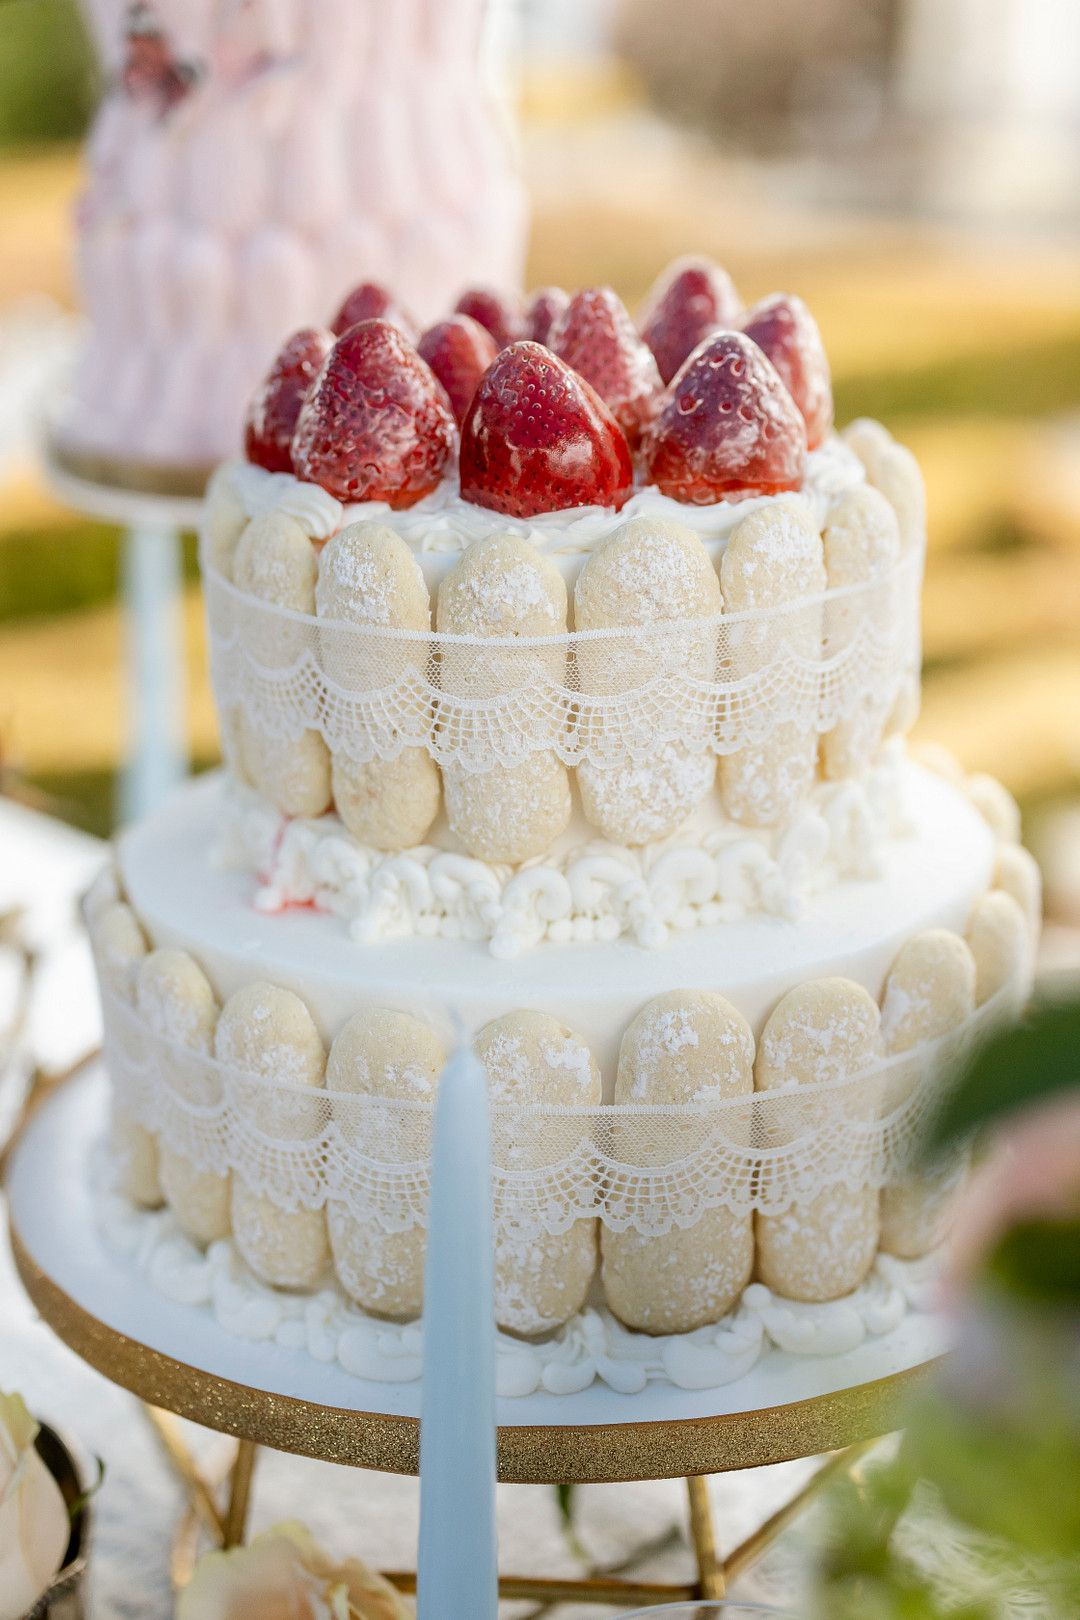 bridgerton netflix cake